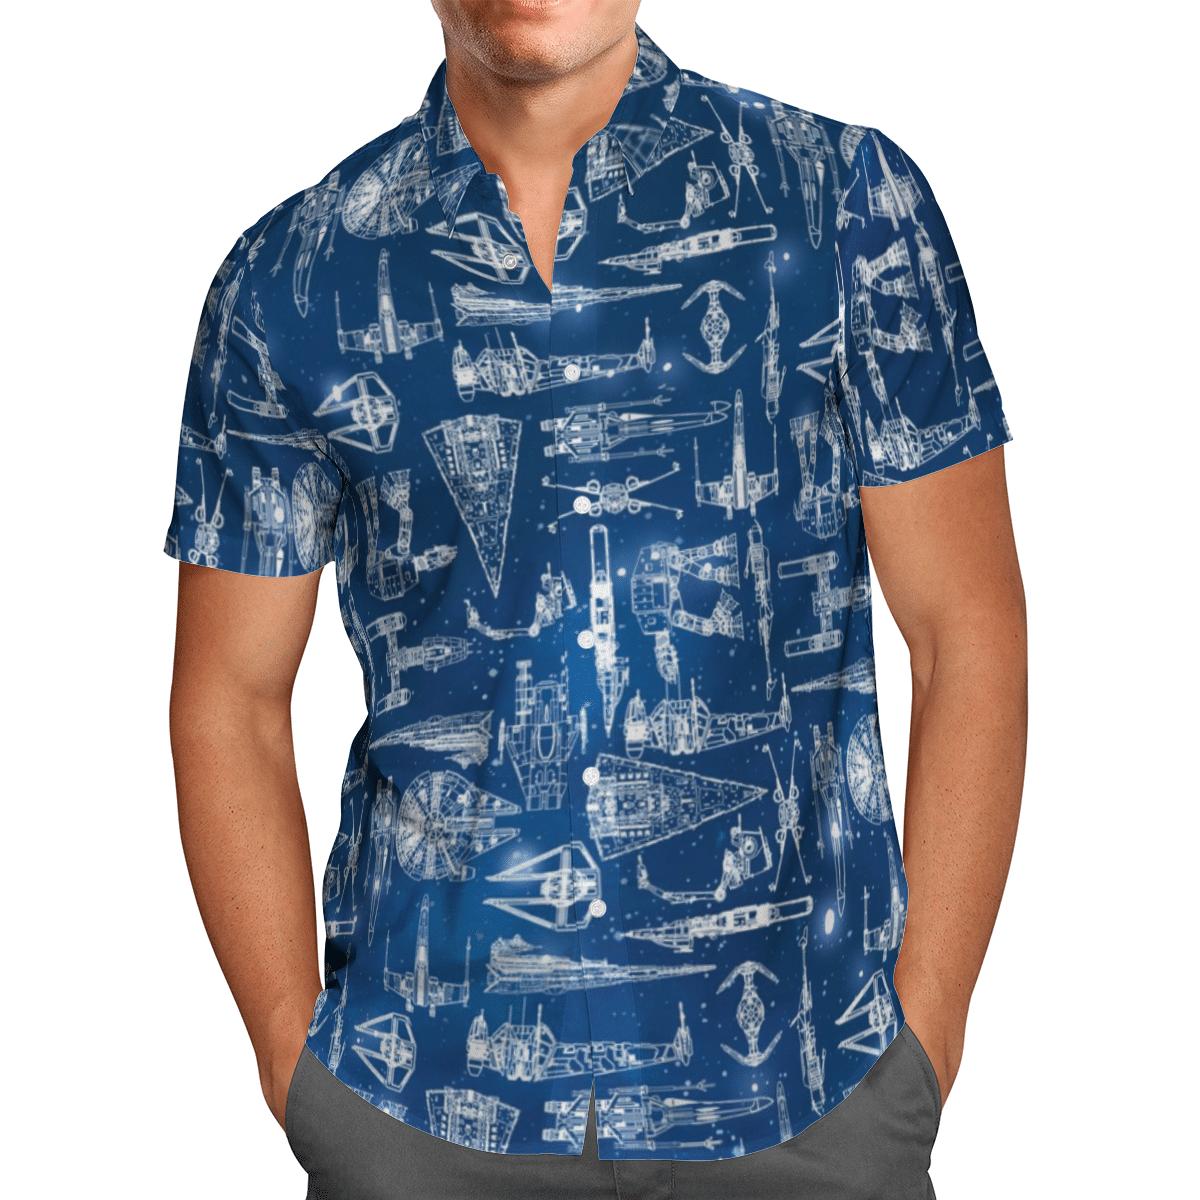 Starship Star Wars Hawaiian shirt and short - LIMITED EDITION